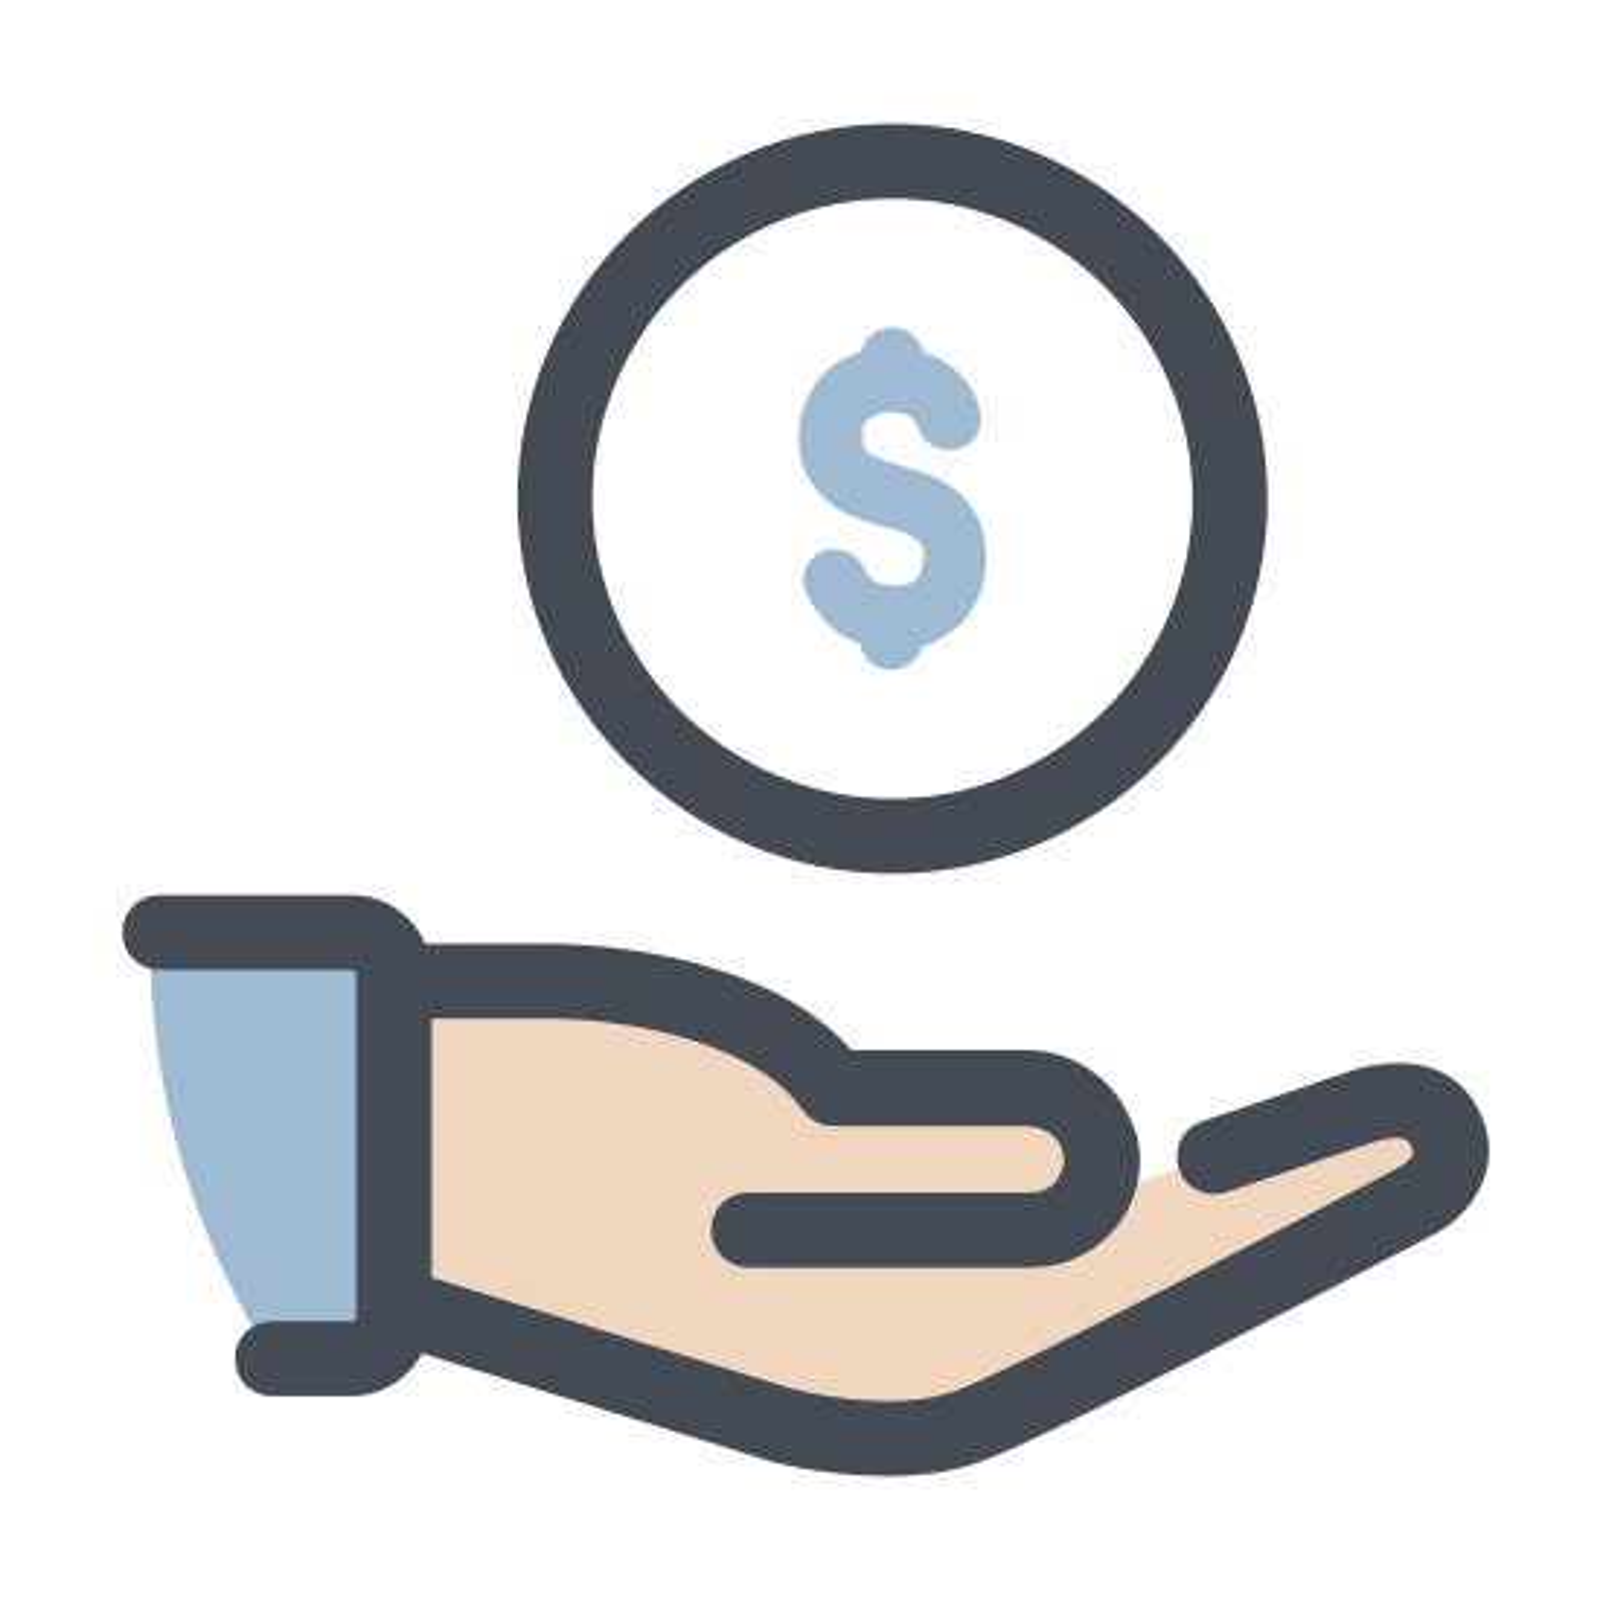 Get Cash icon